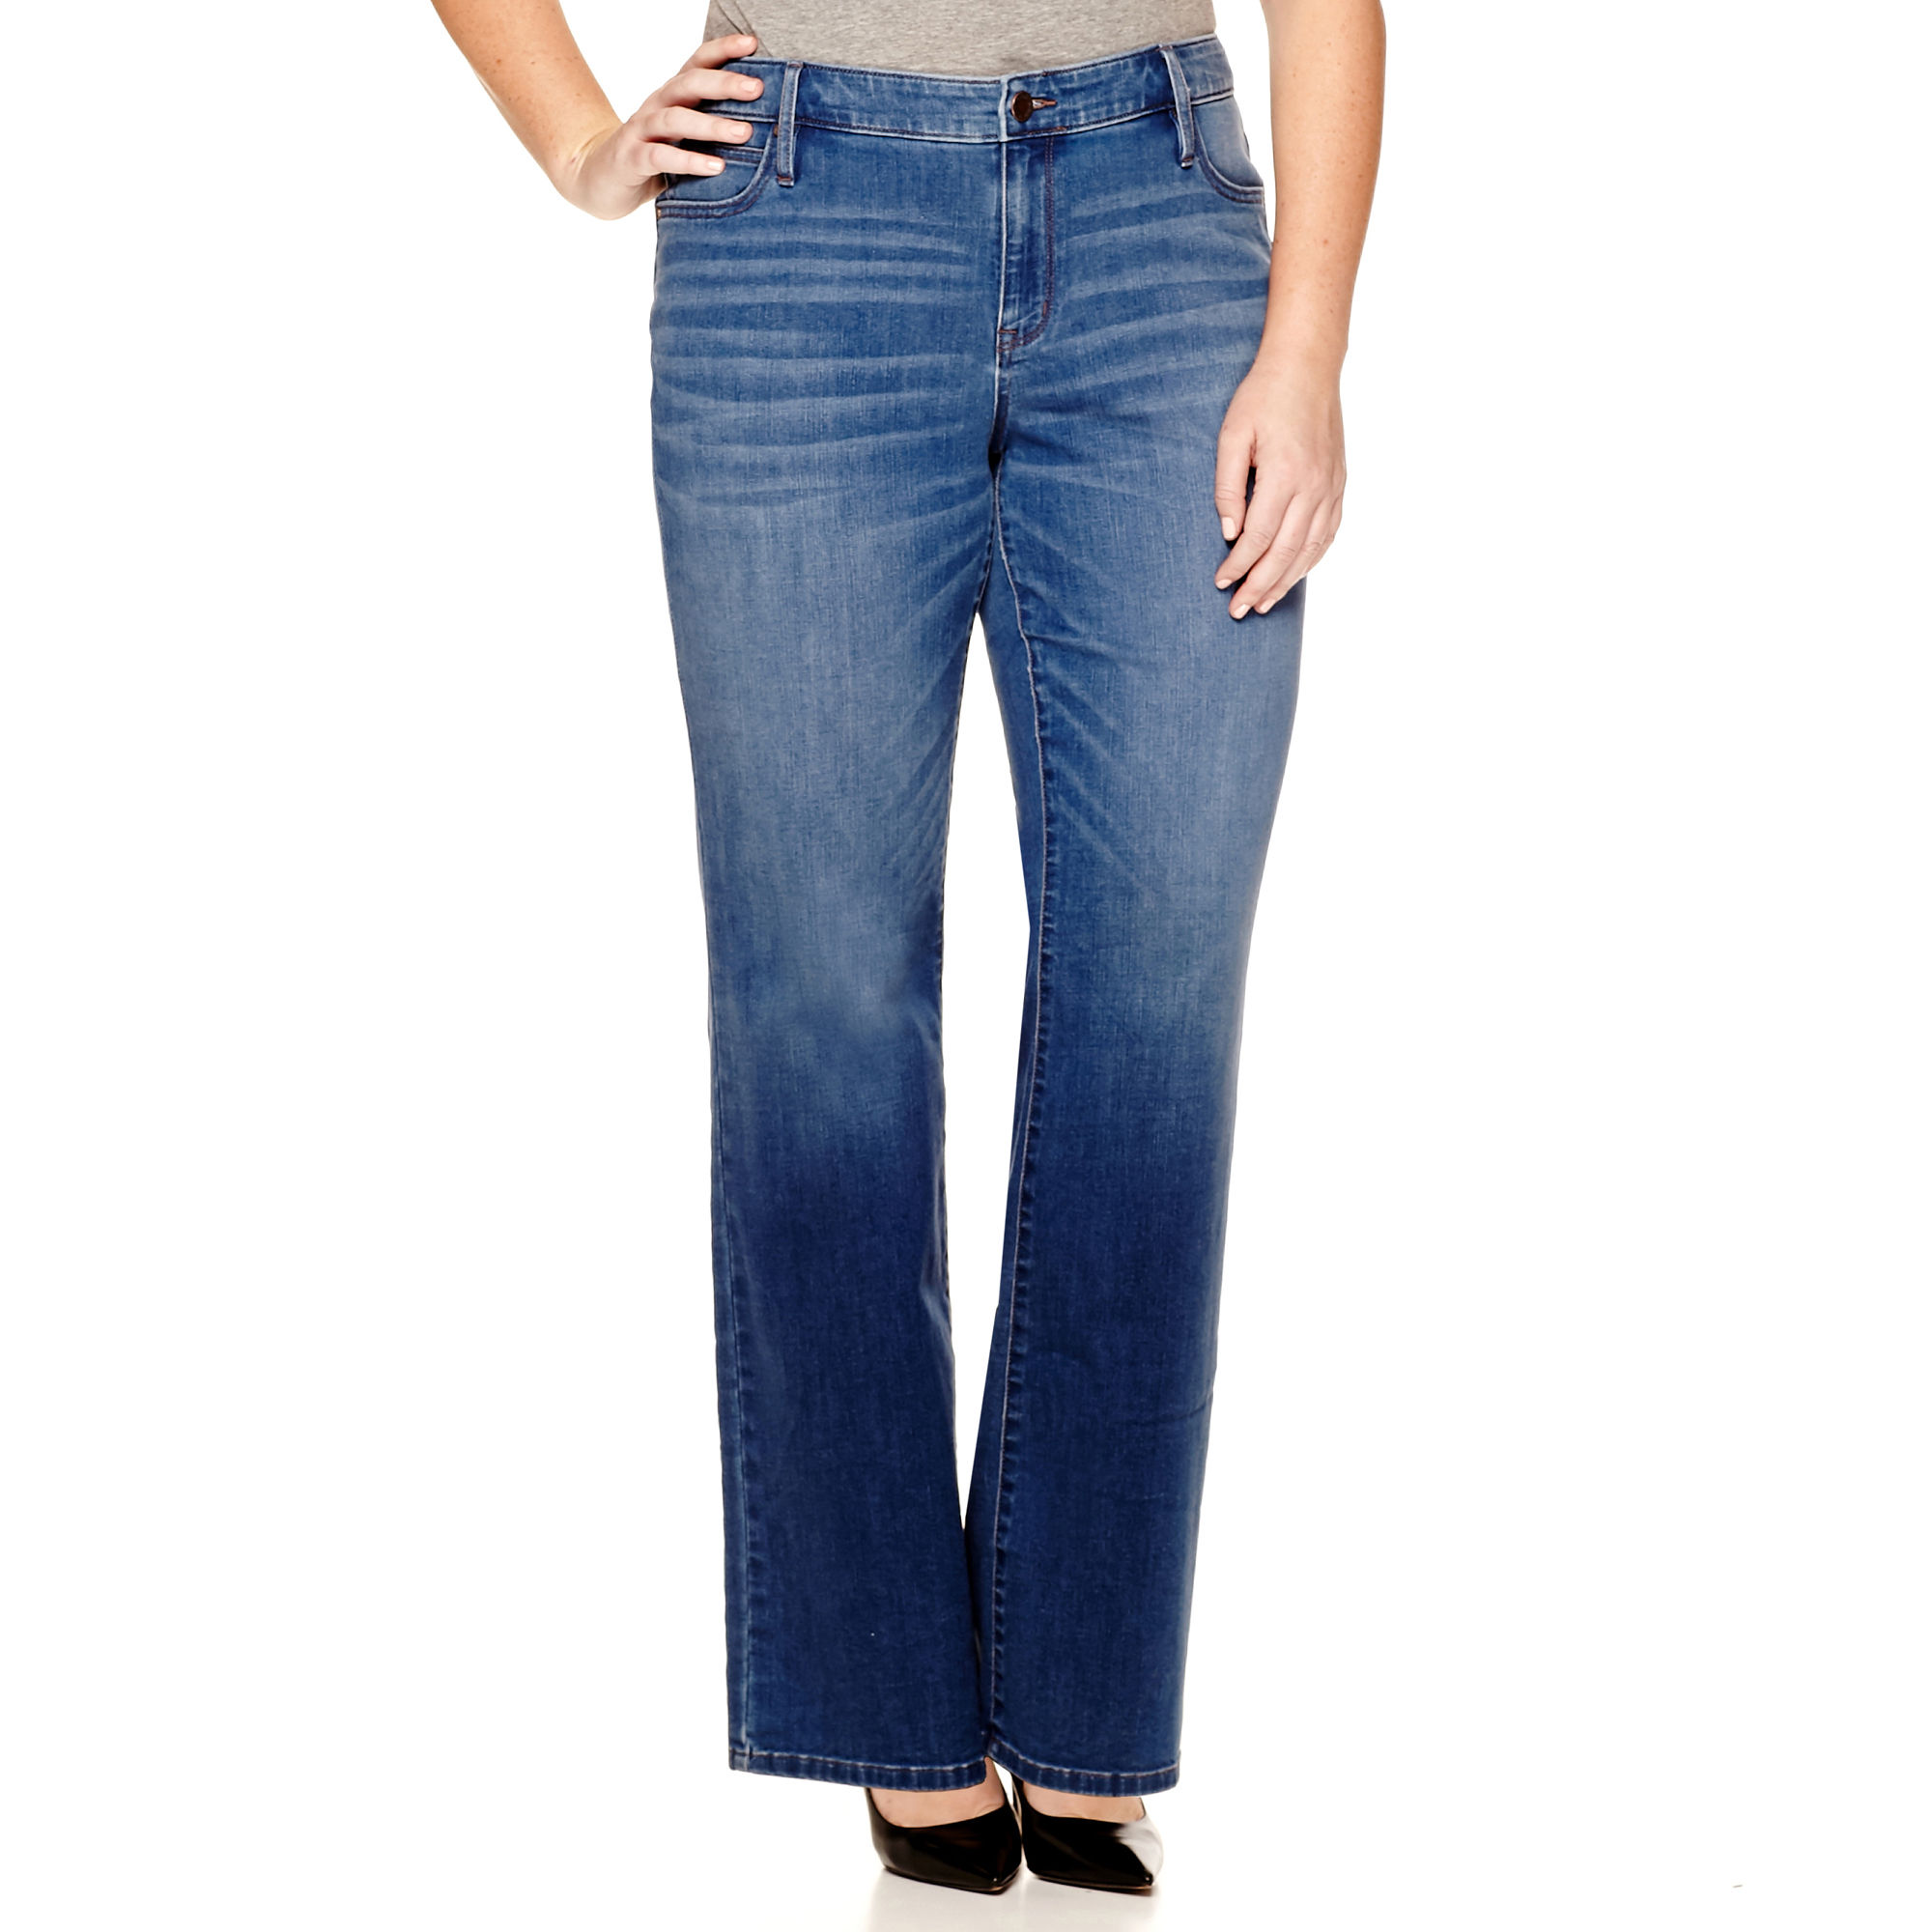 a.n.a Bootcut Jeans - Plus